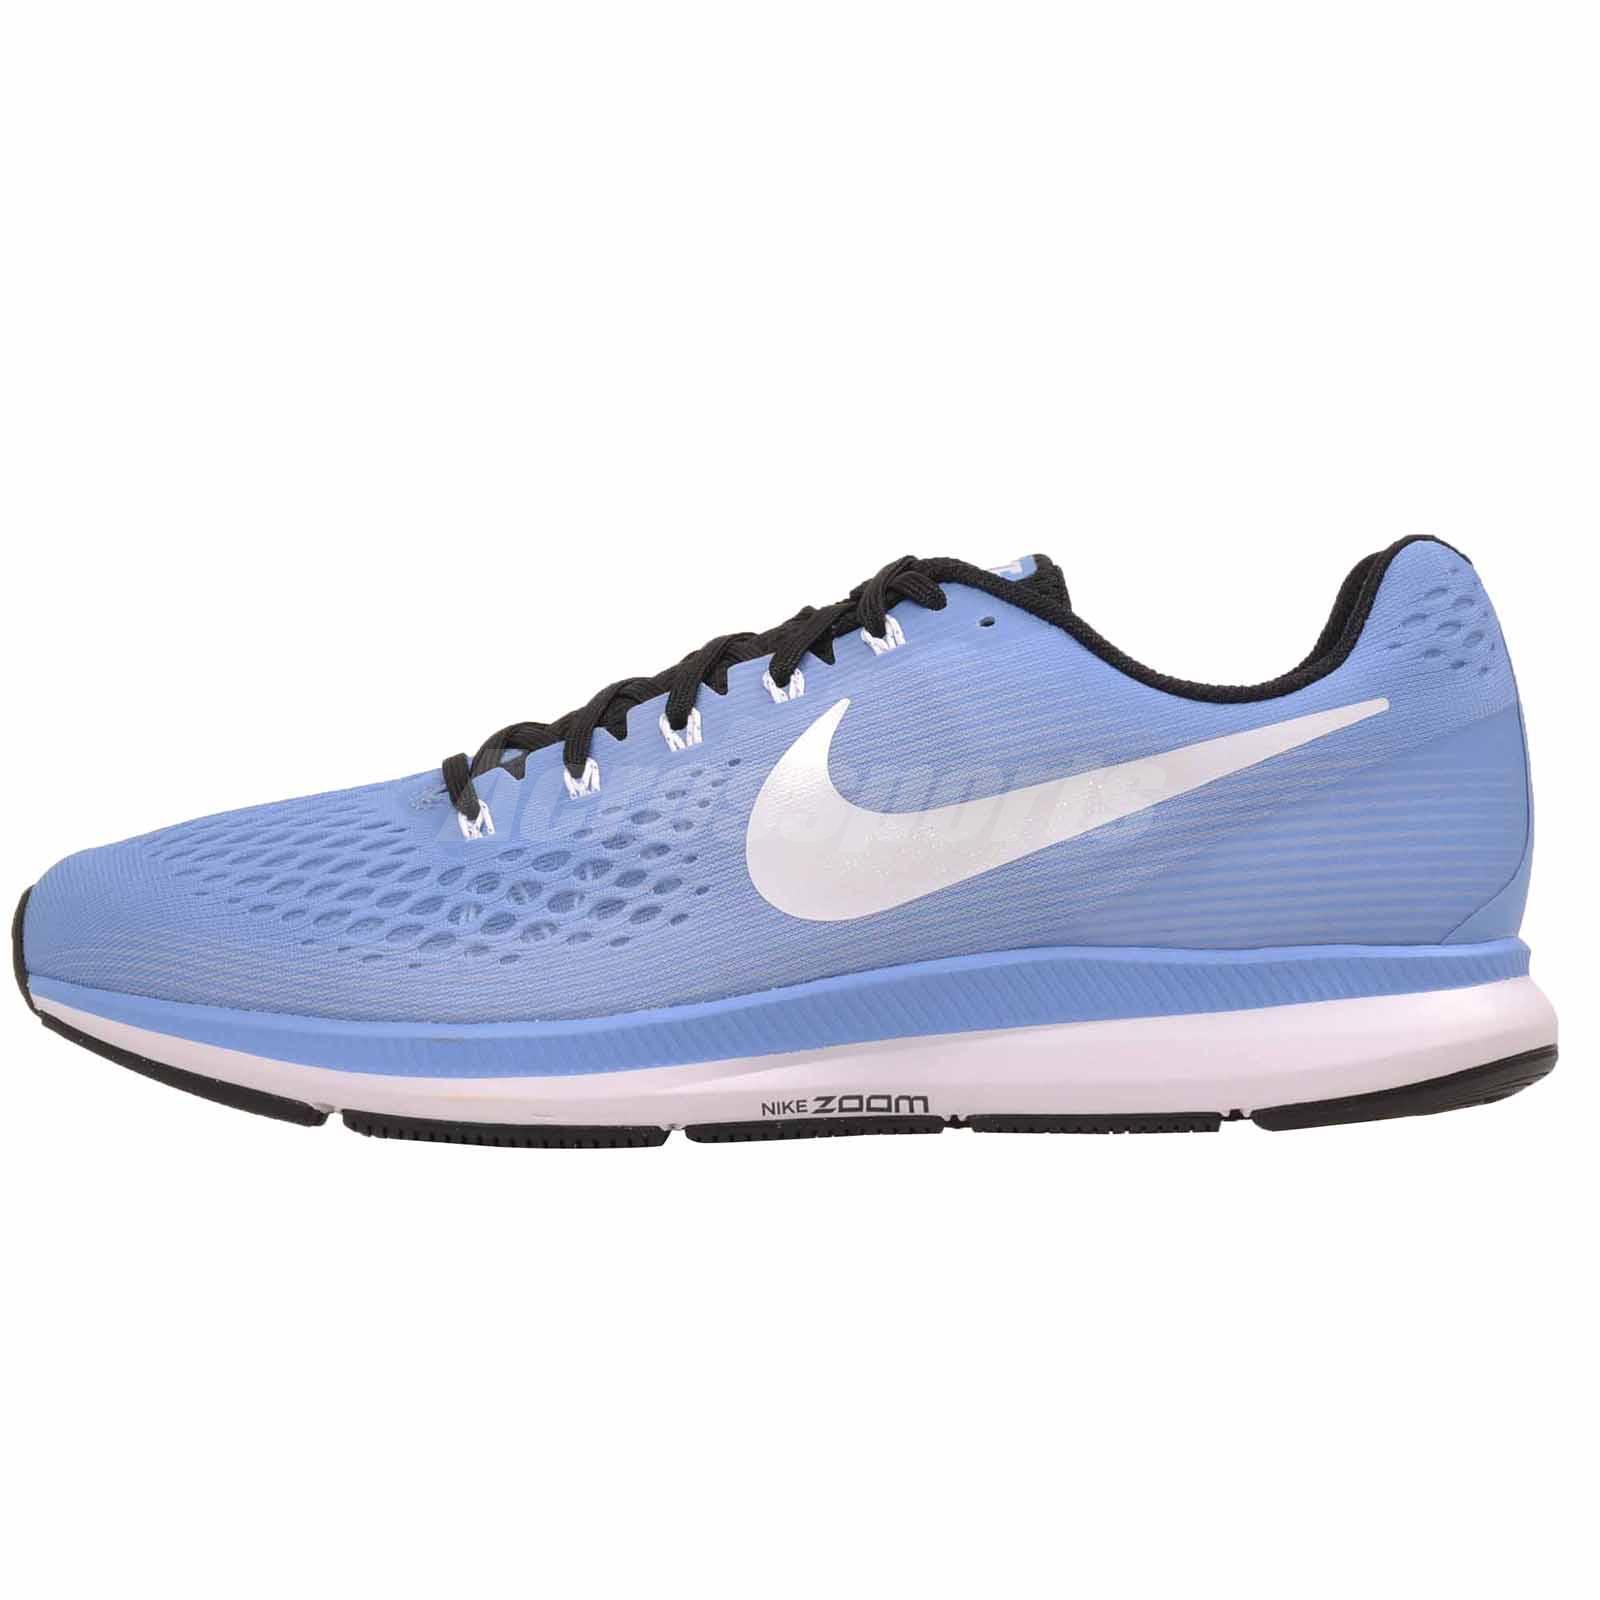 Nike Air Zoom Pegasus 34 TB Running Mens shoes NWOB bluee 887009-403